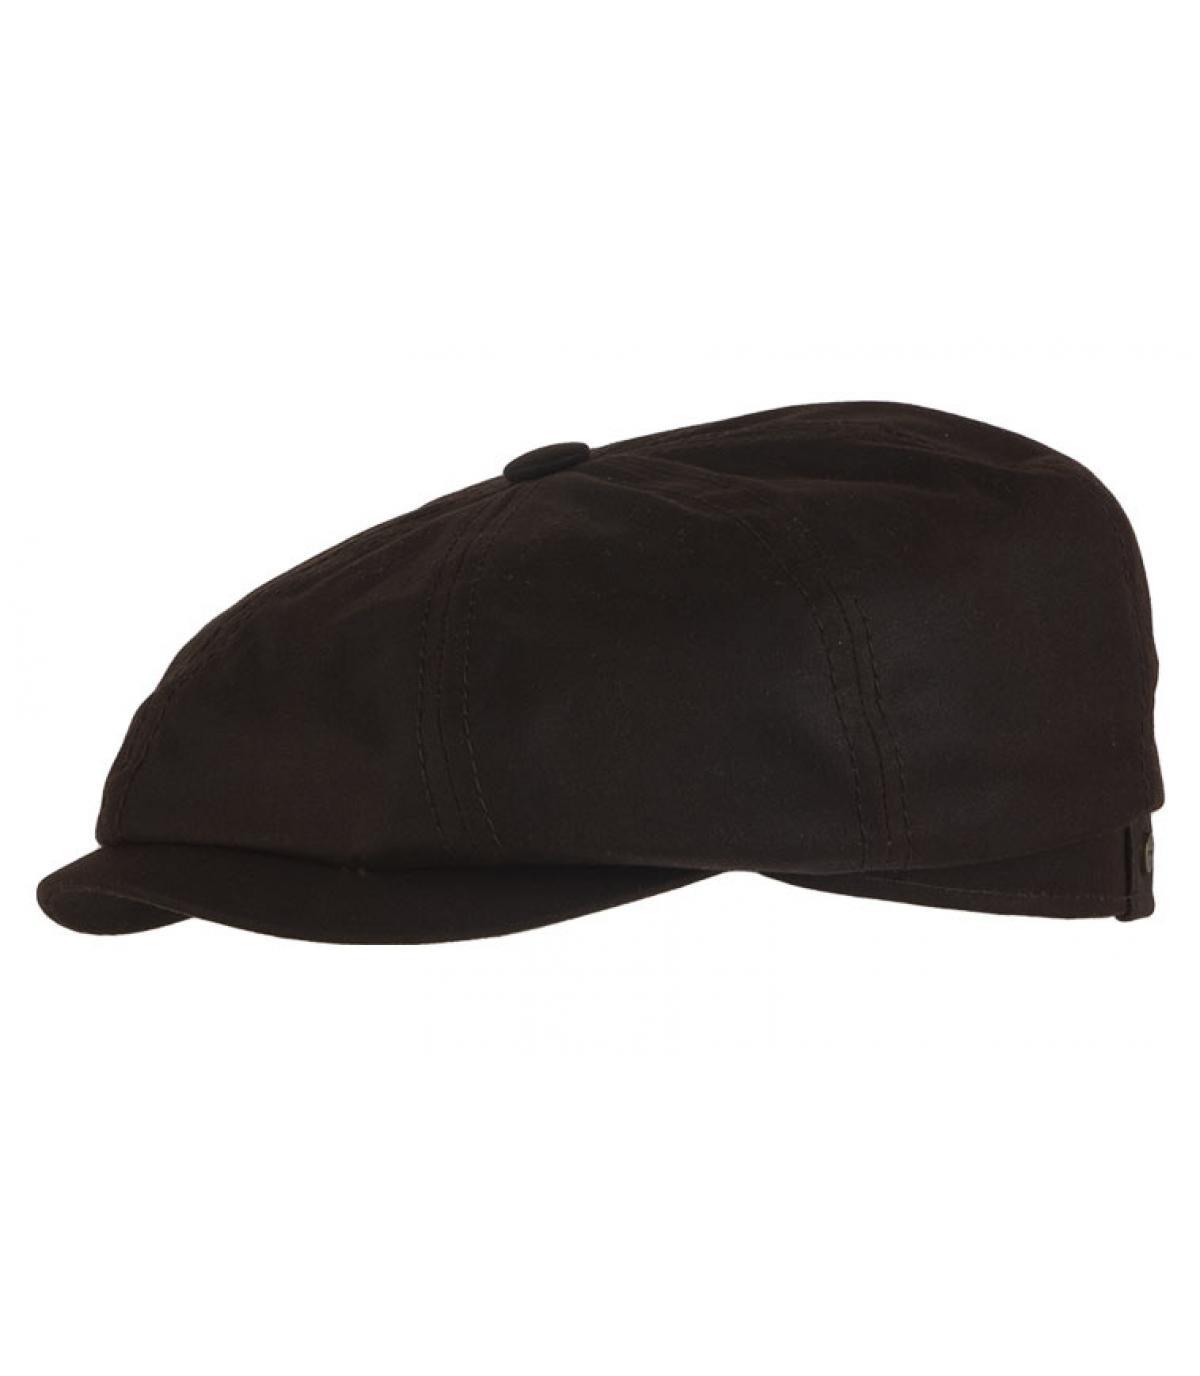 Hatteras algodón huilé marrón